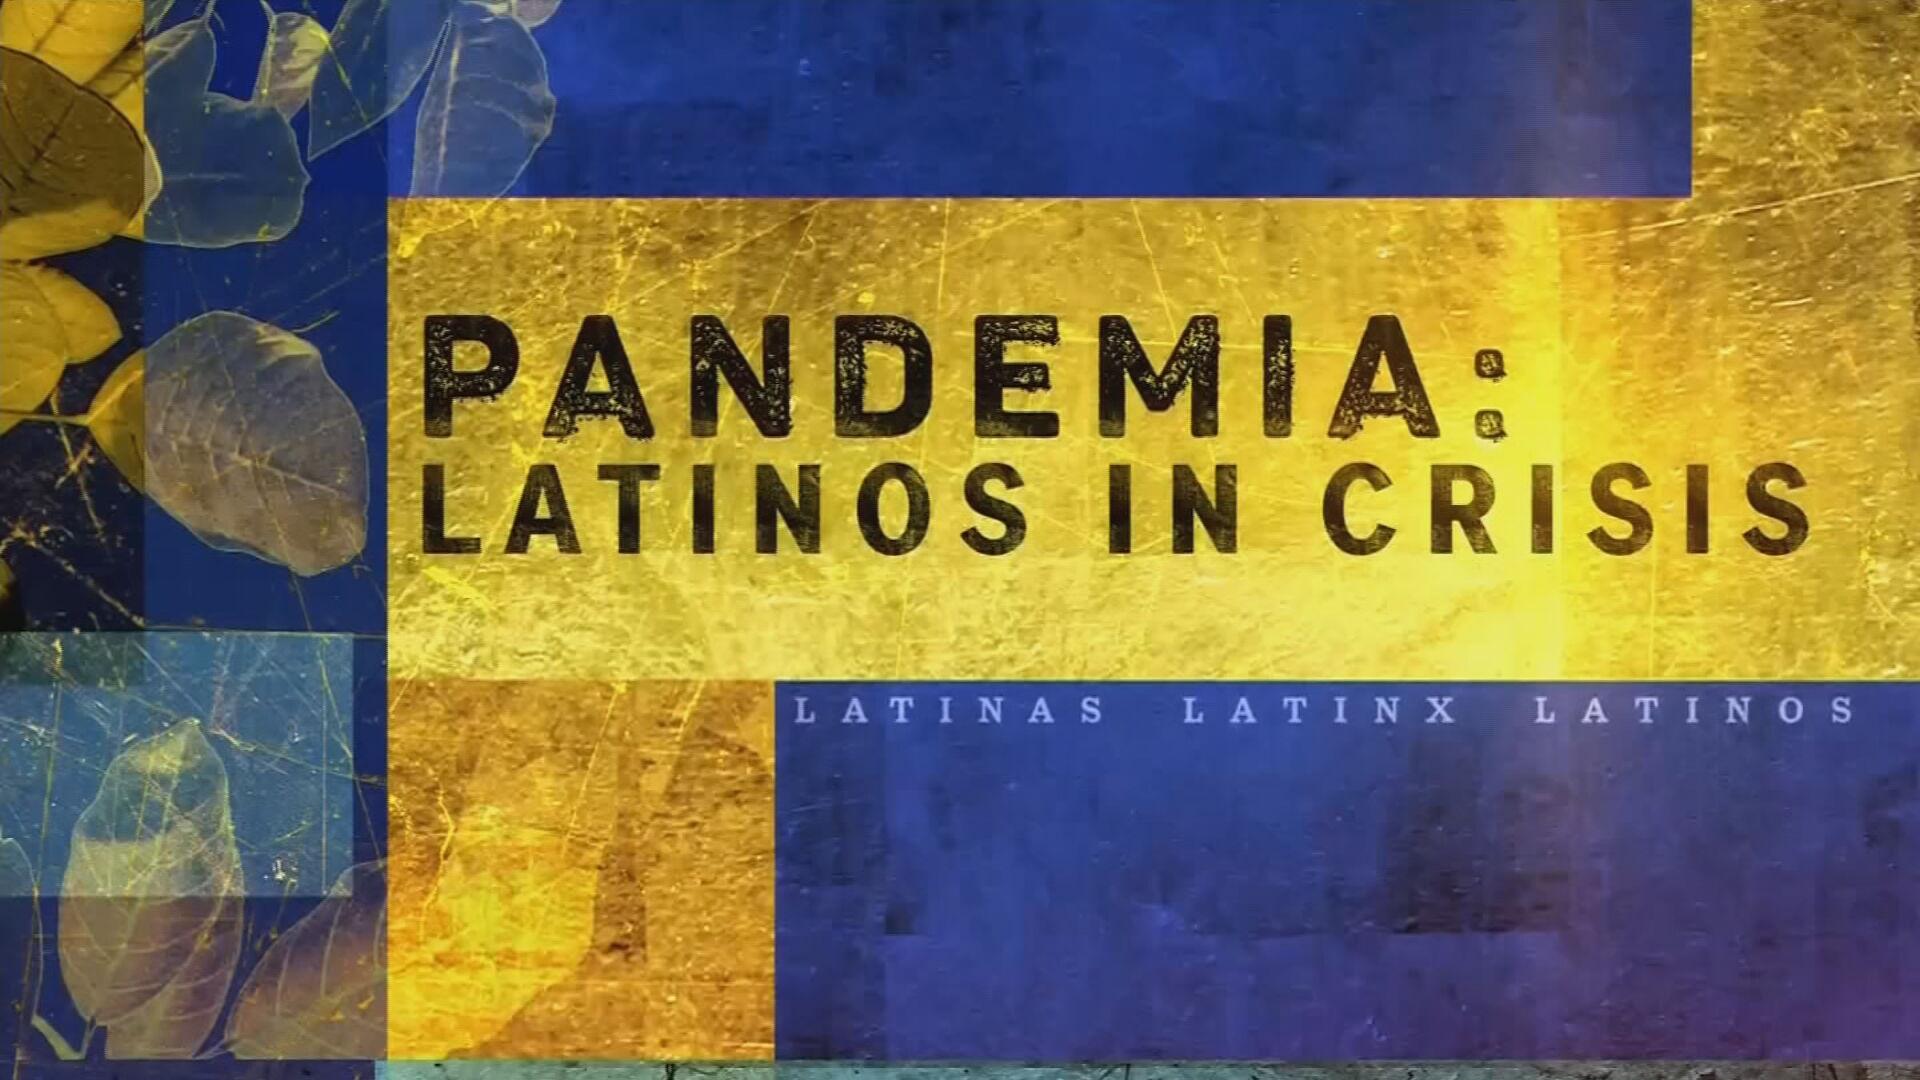 CBS Documentary Covers Impact Of Coronavirus On US Latinx Population